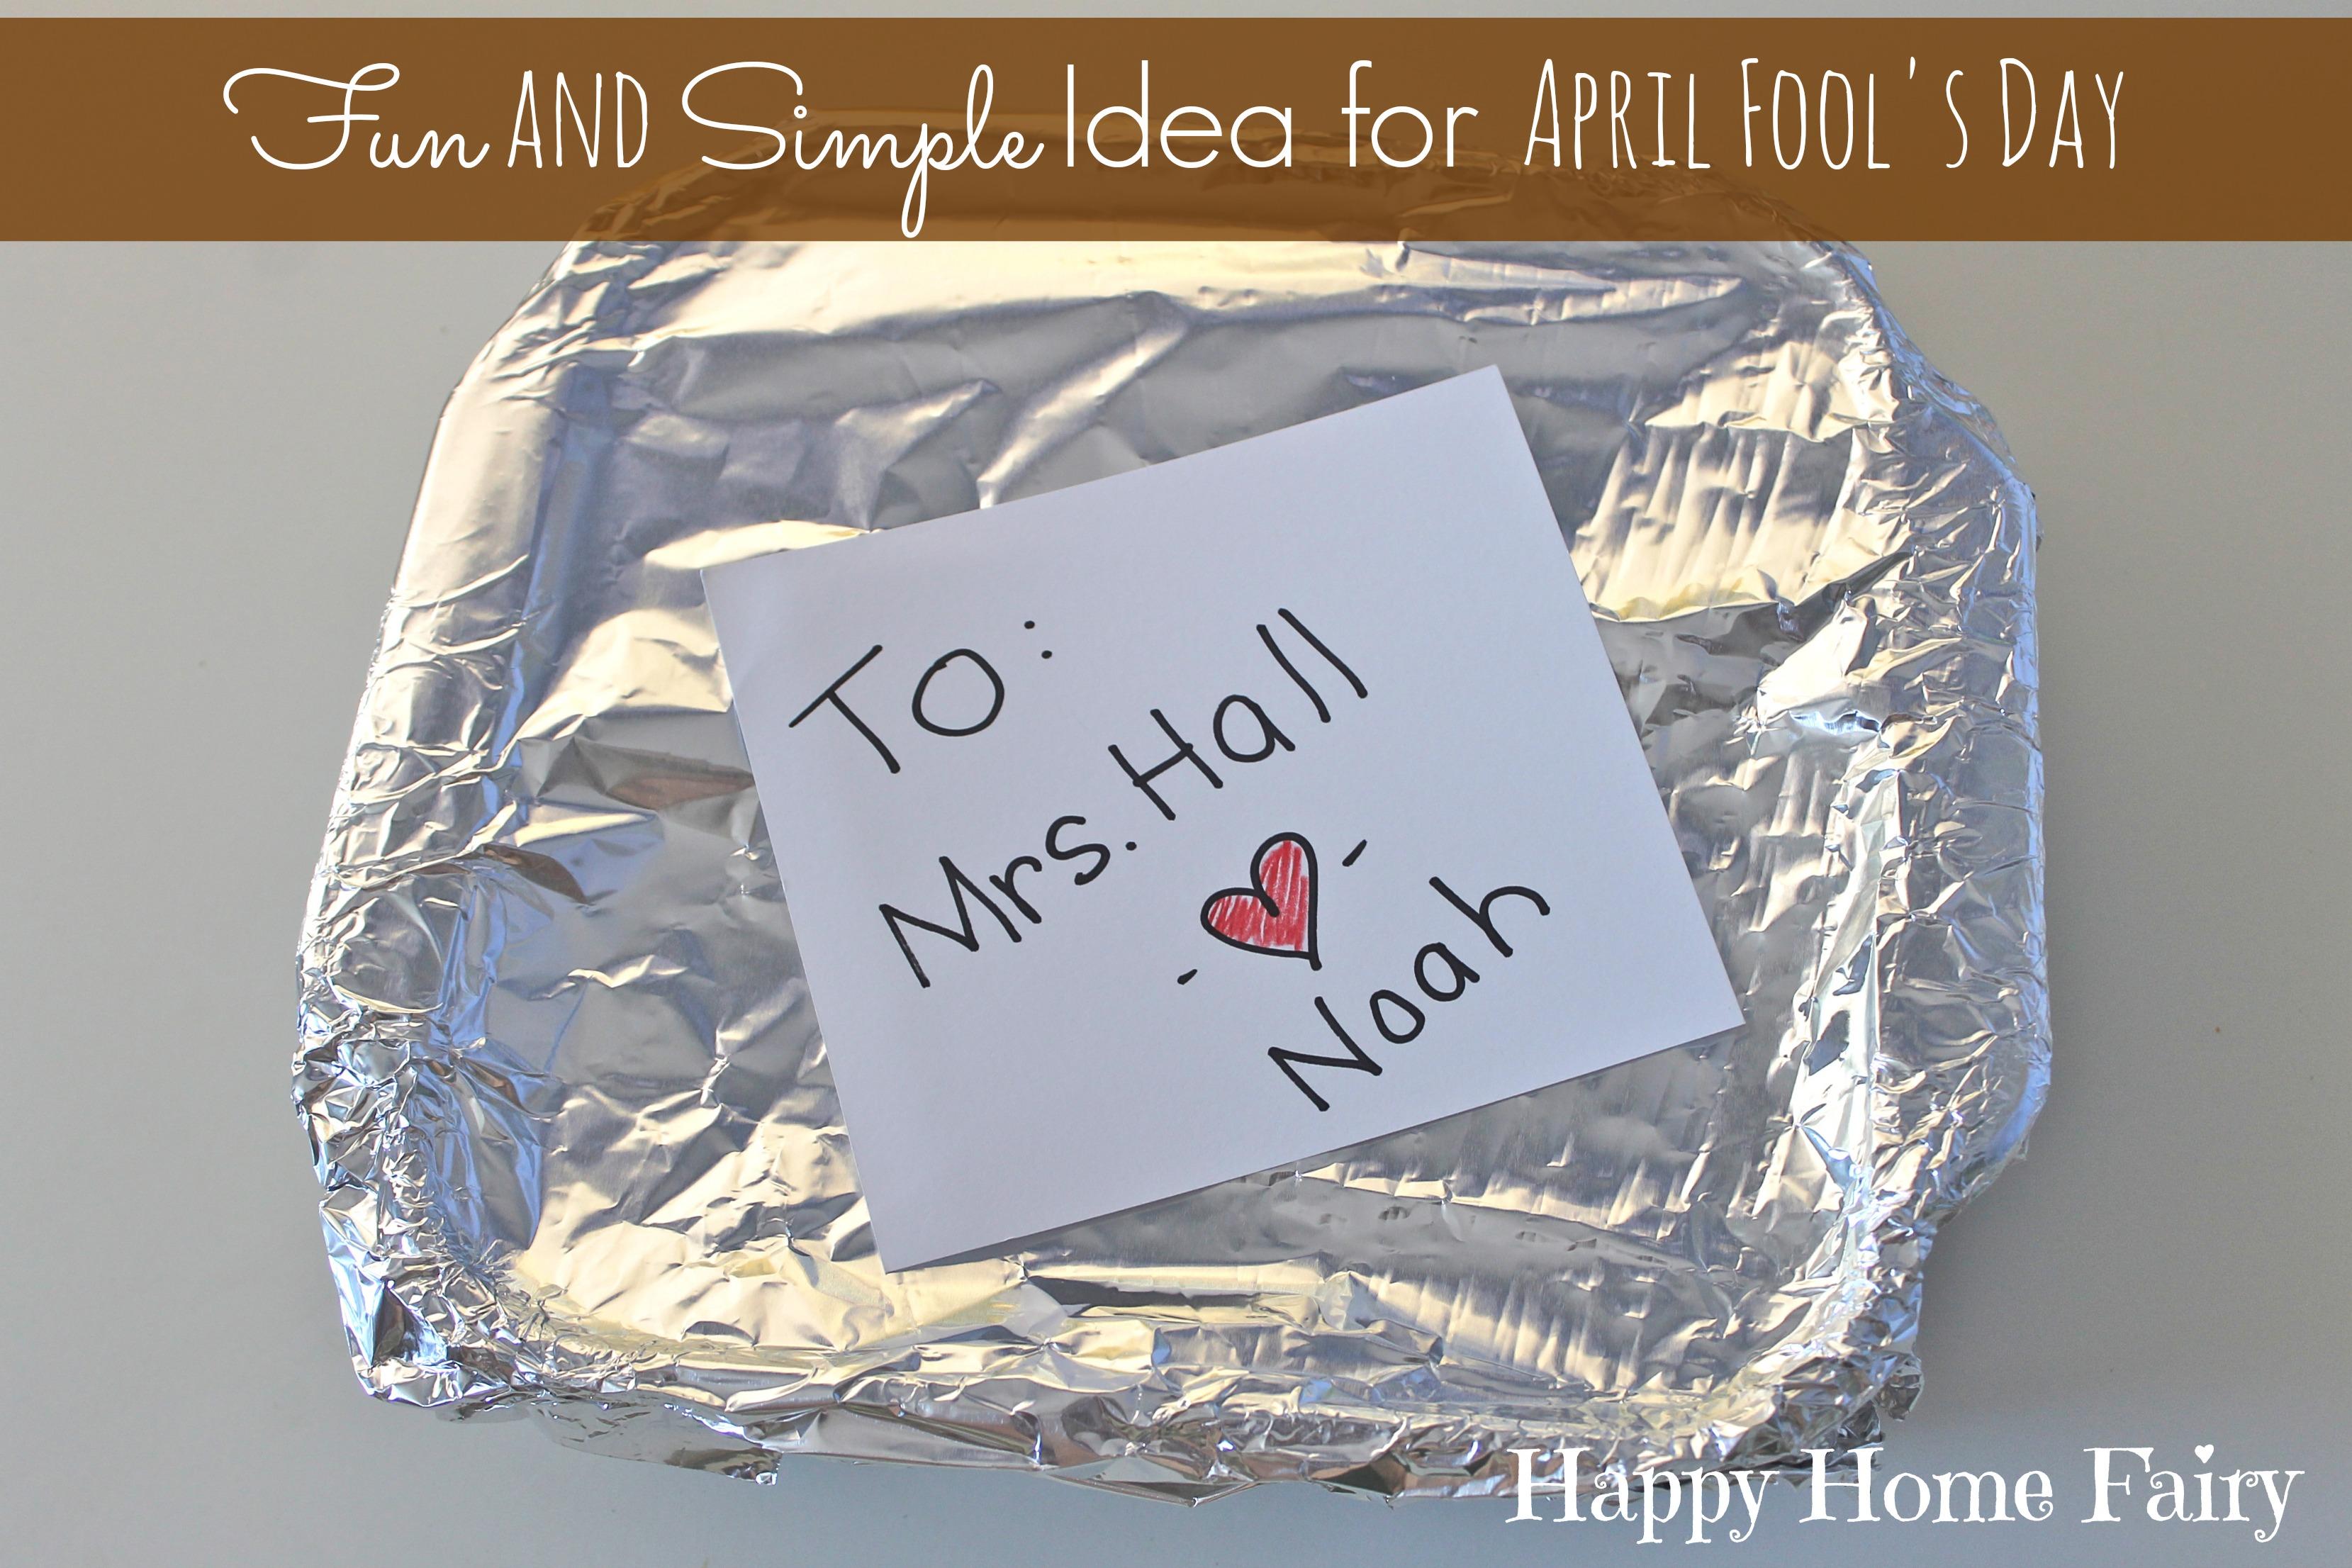 medium resolution of Last Minute Hilarious April Fool's Day Joke - Happy Home Fairy